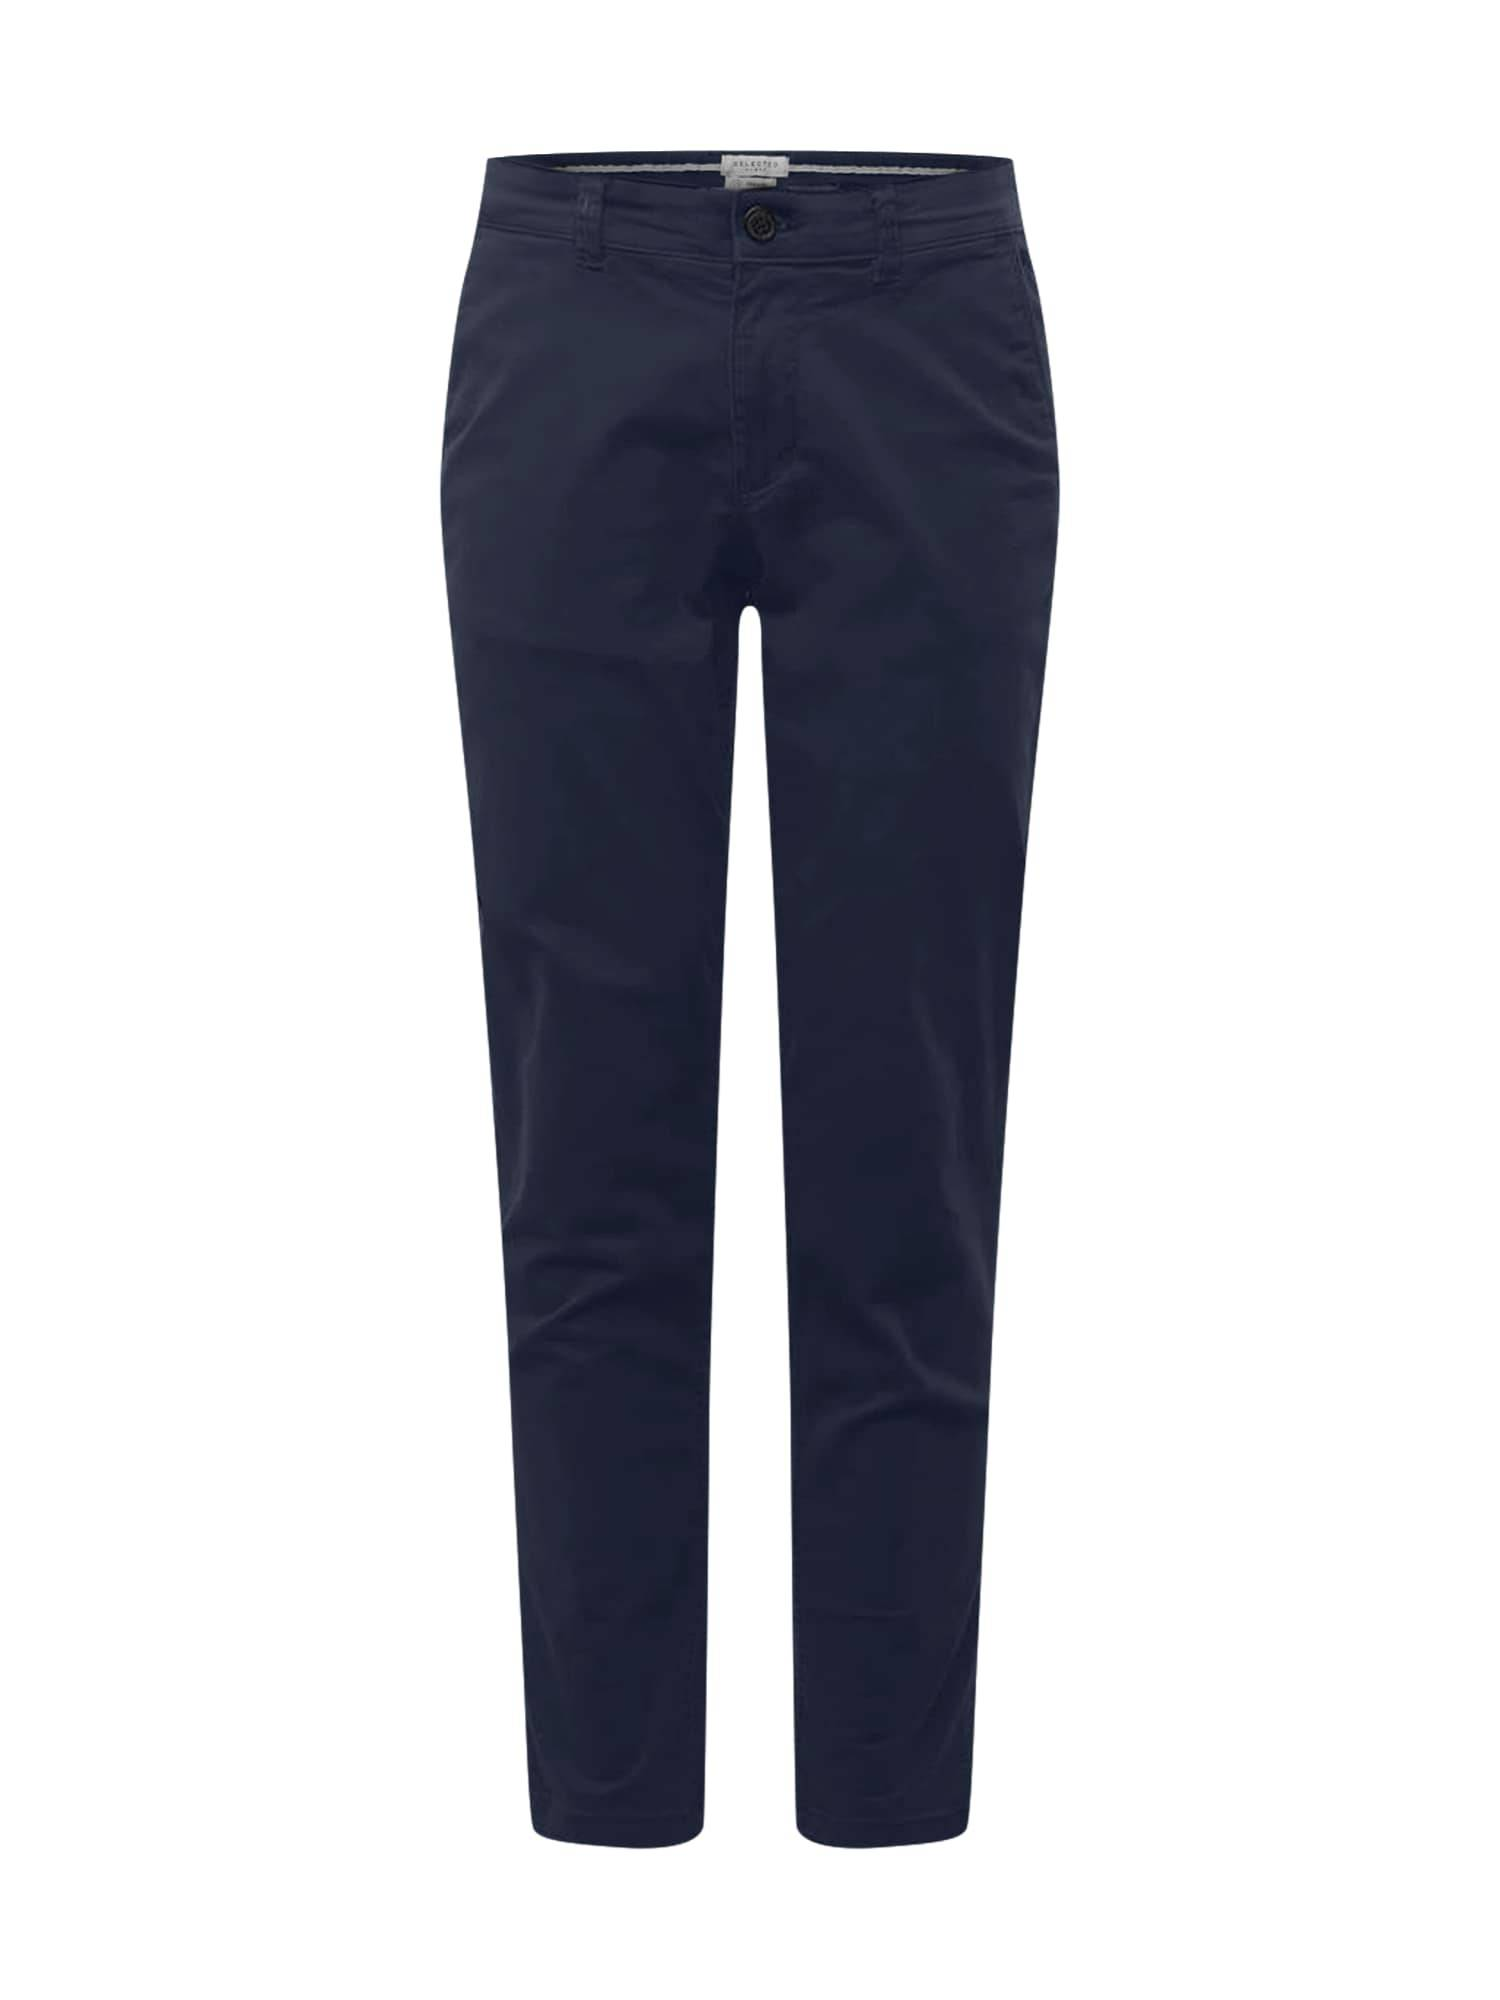 SELECTED HOMME Pantalon chino 'NEW PARIS'  - Bleu - Taille: 34 - male